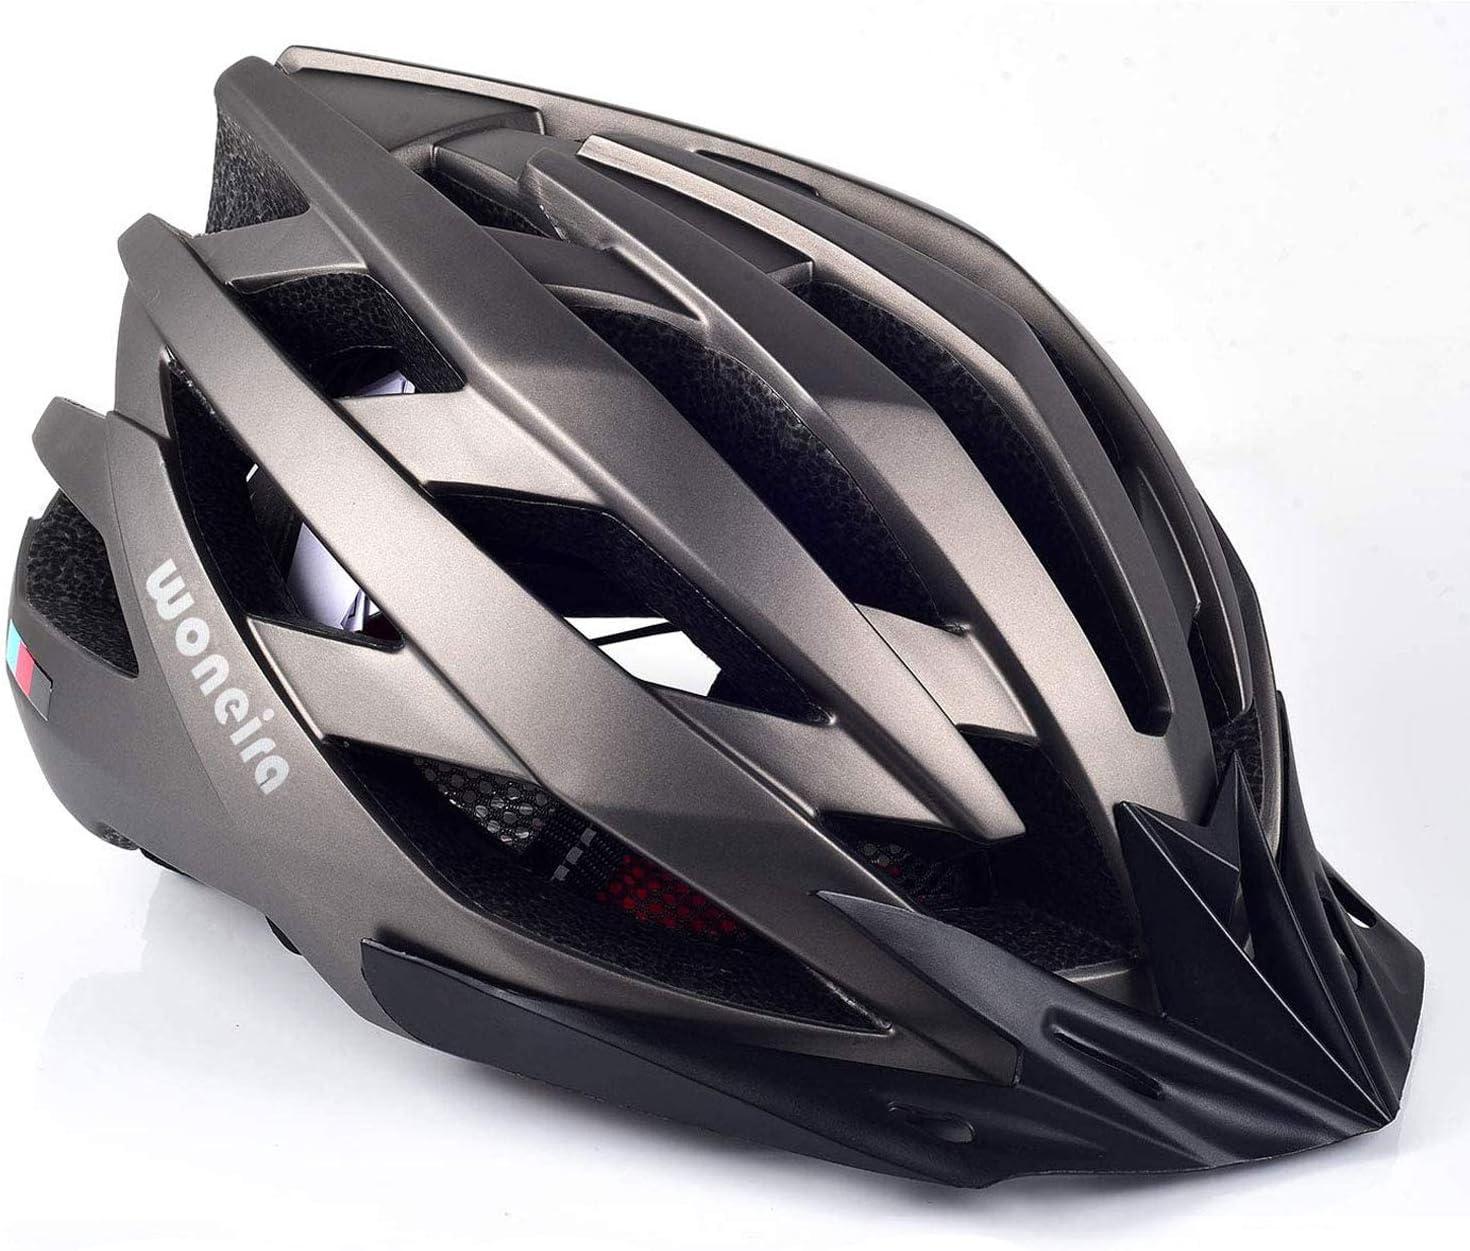 WONEIRA Bike Helmet, Bicycle Helmet with LED Light CPSC&CE Certified Adult Cycling Helmet for Men Women Adjustable Ultralight Stable Mountain & Road Biking Helmets